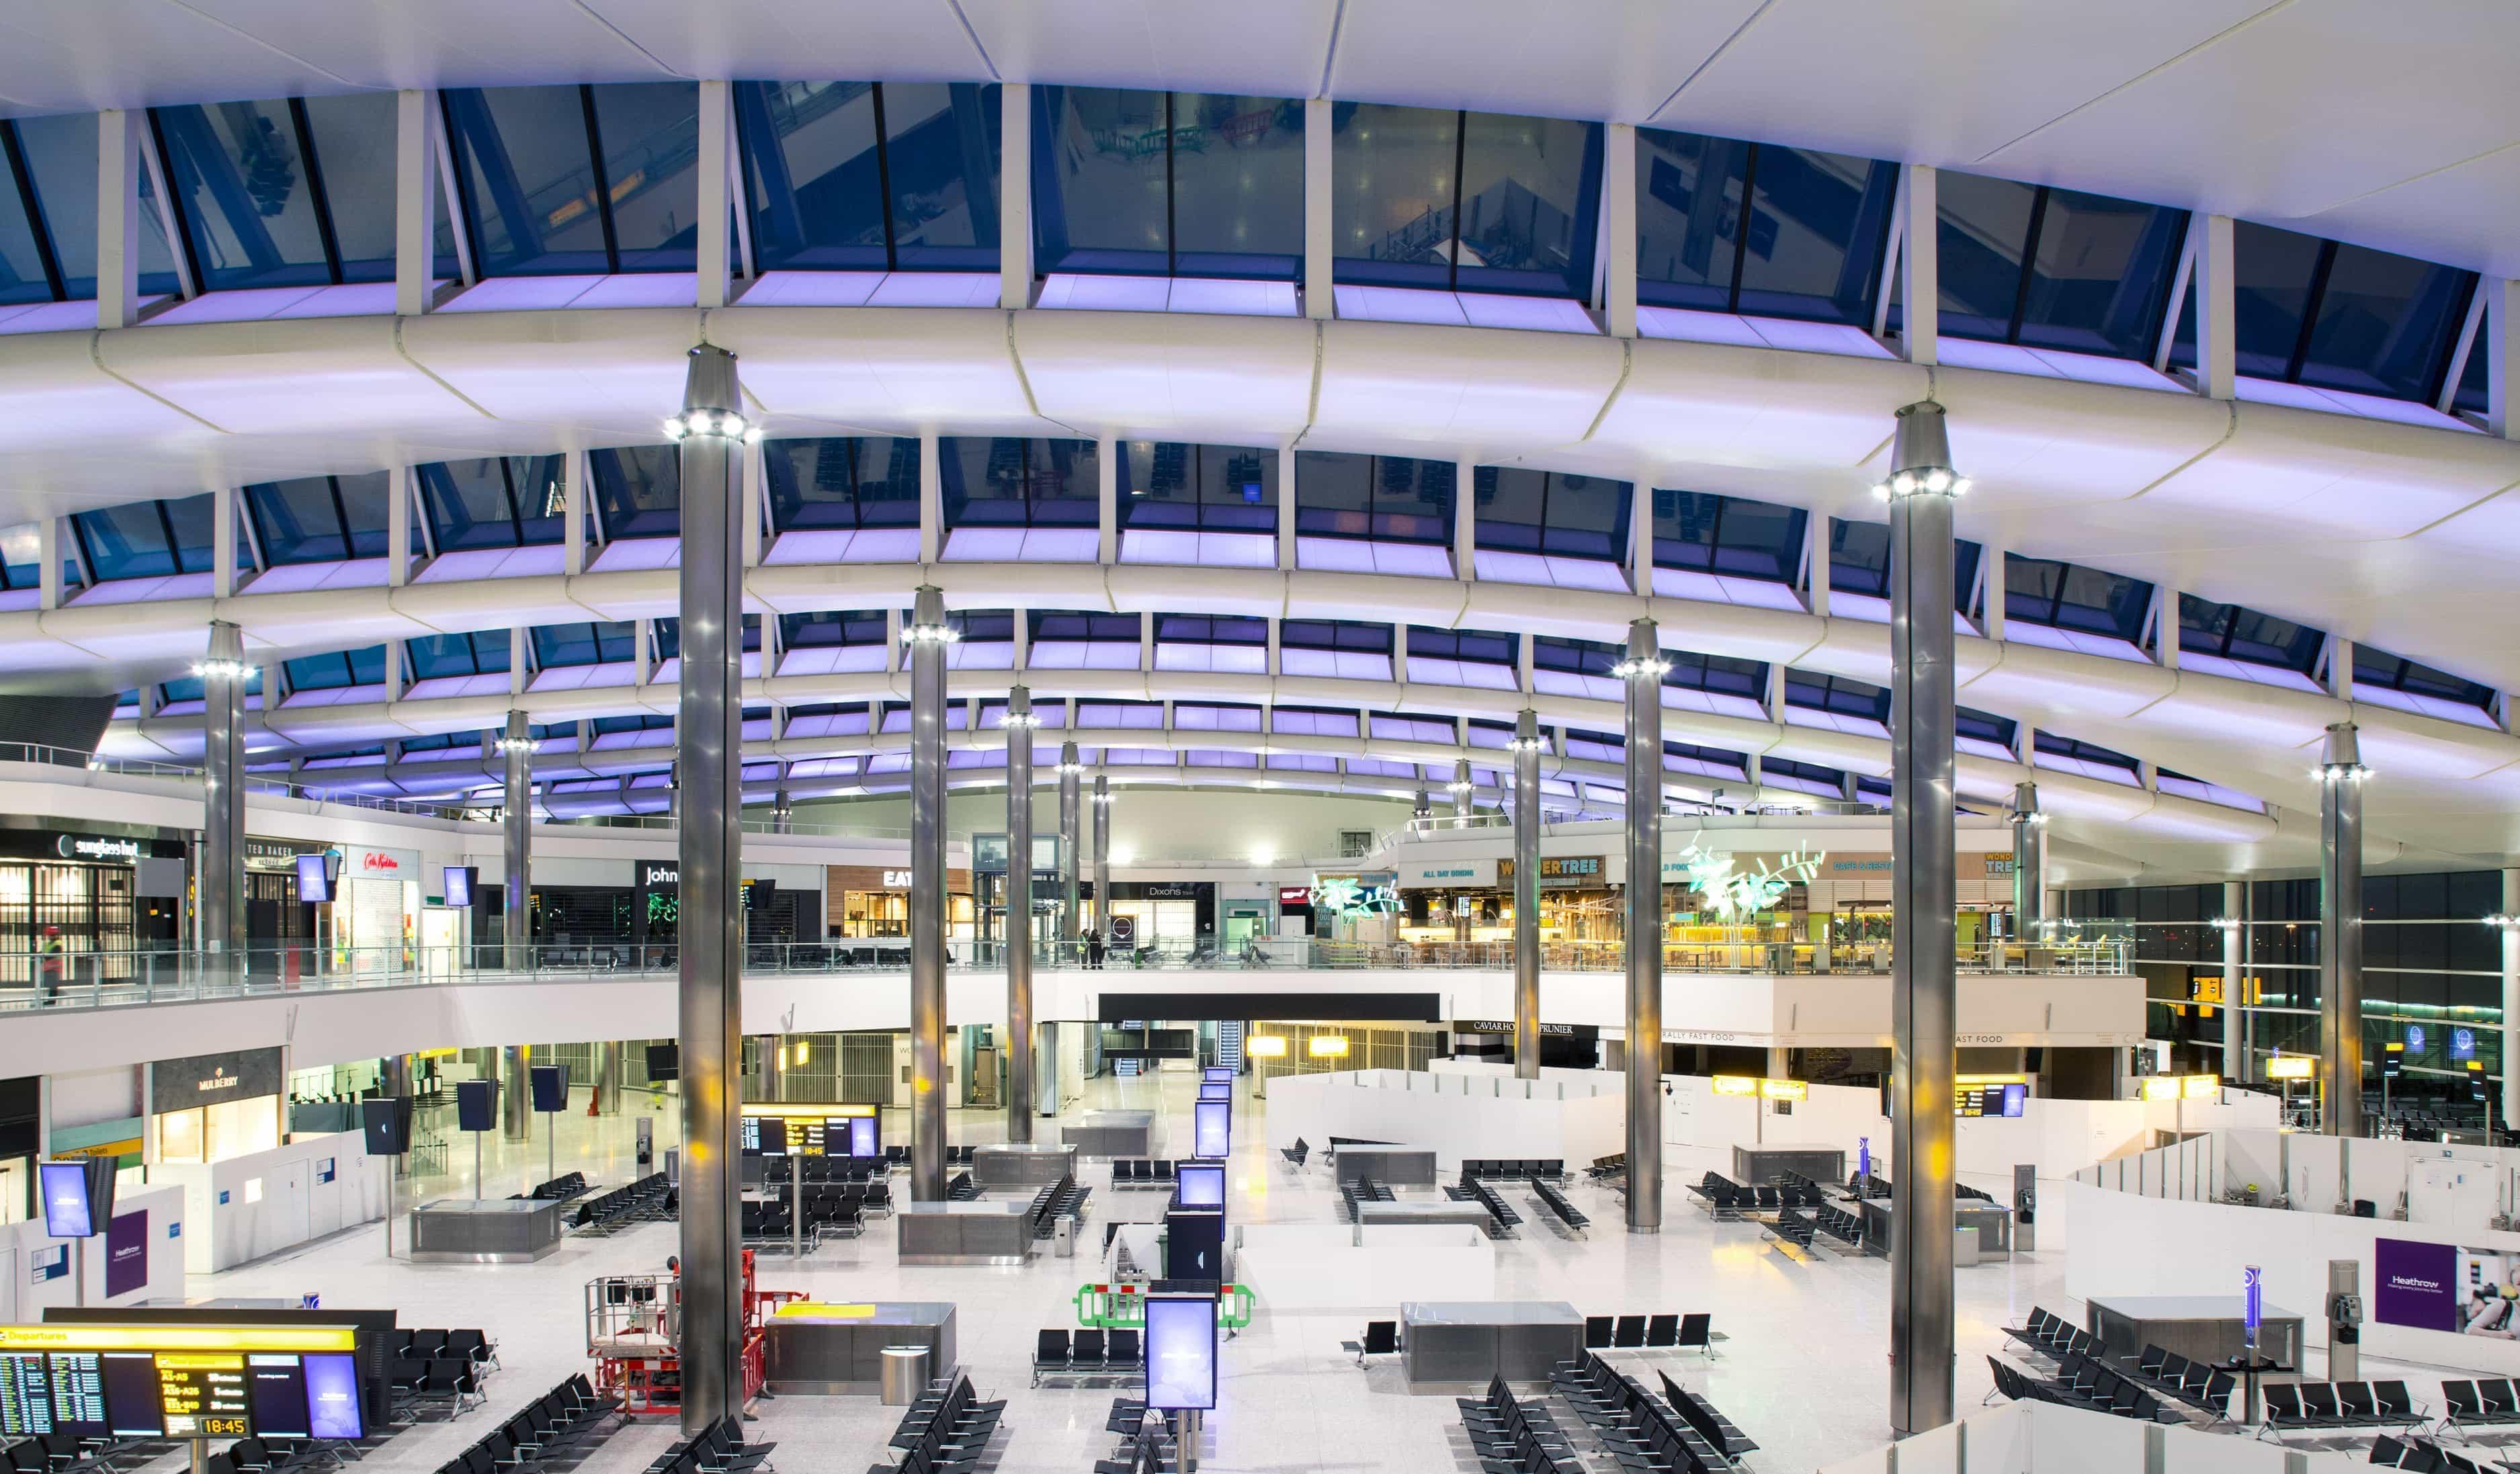 Heathrow Airport - Ferrovial